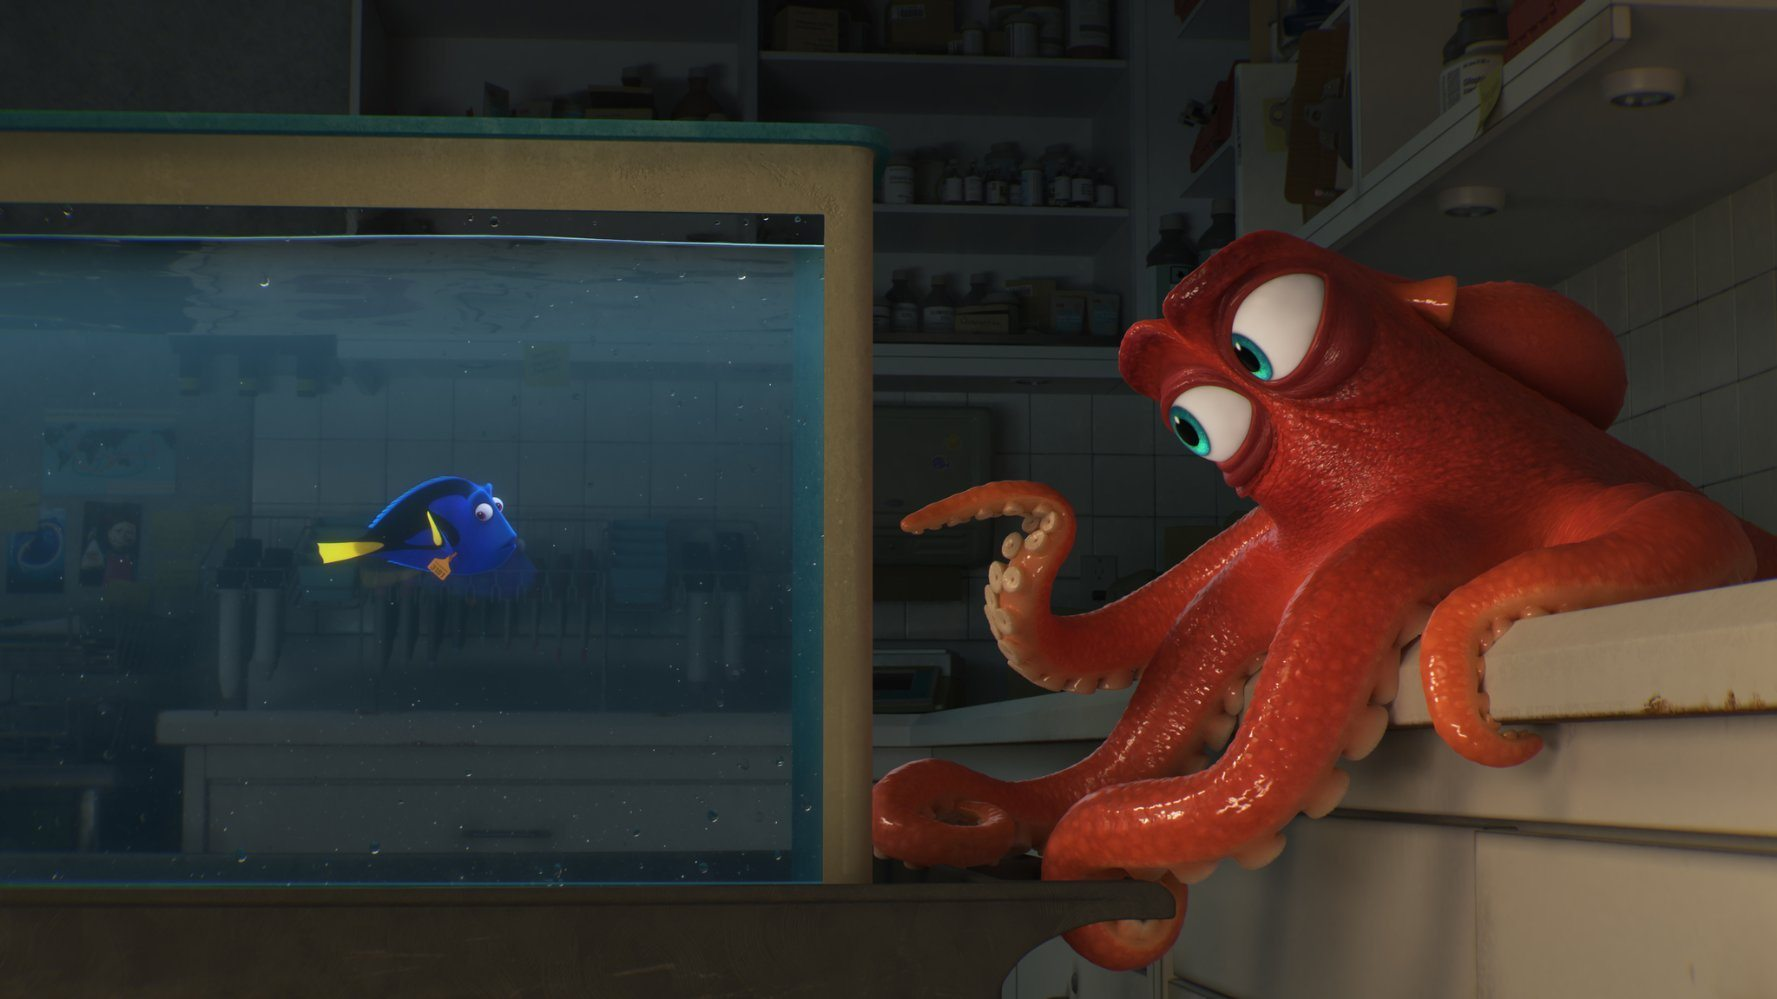 (Finding Dory, Disney/Pixar)